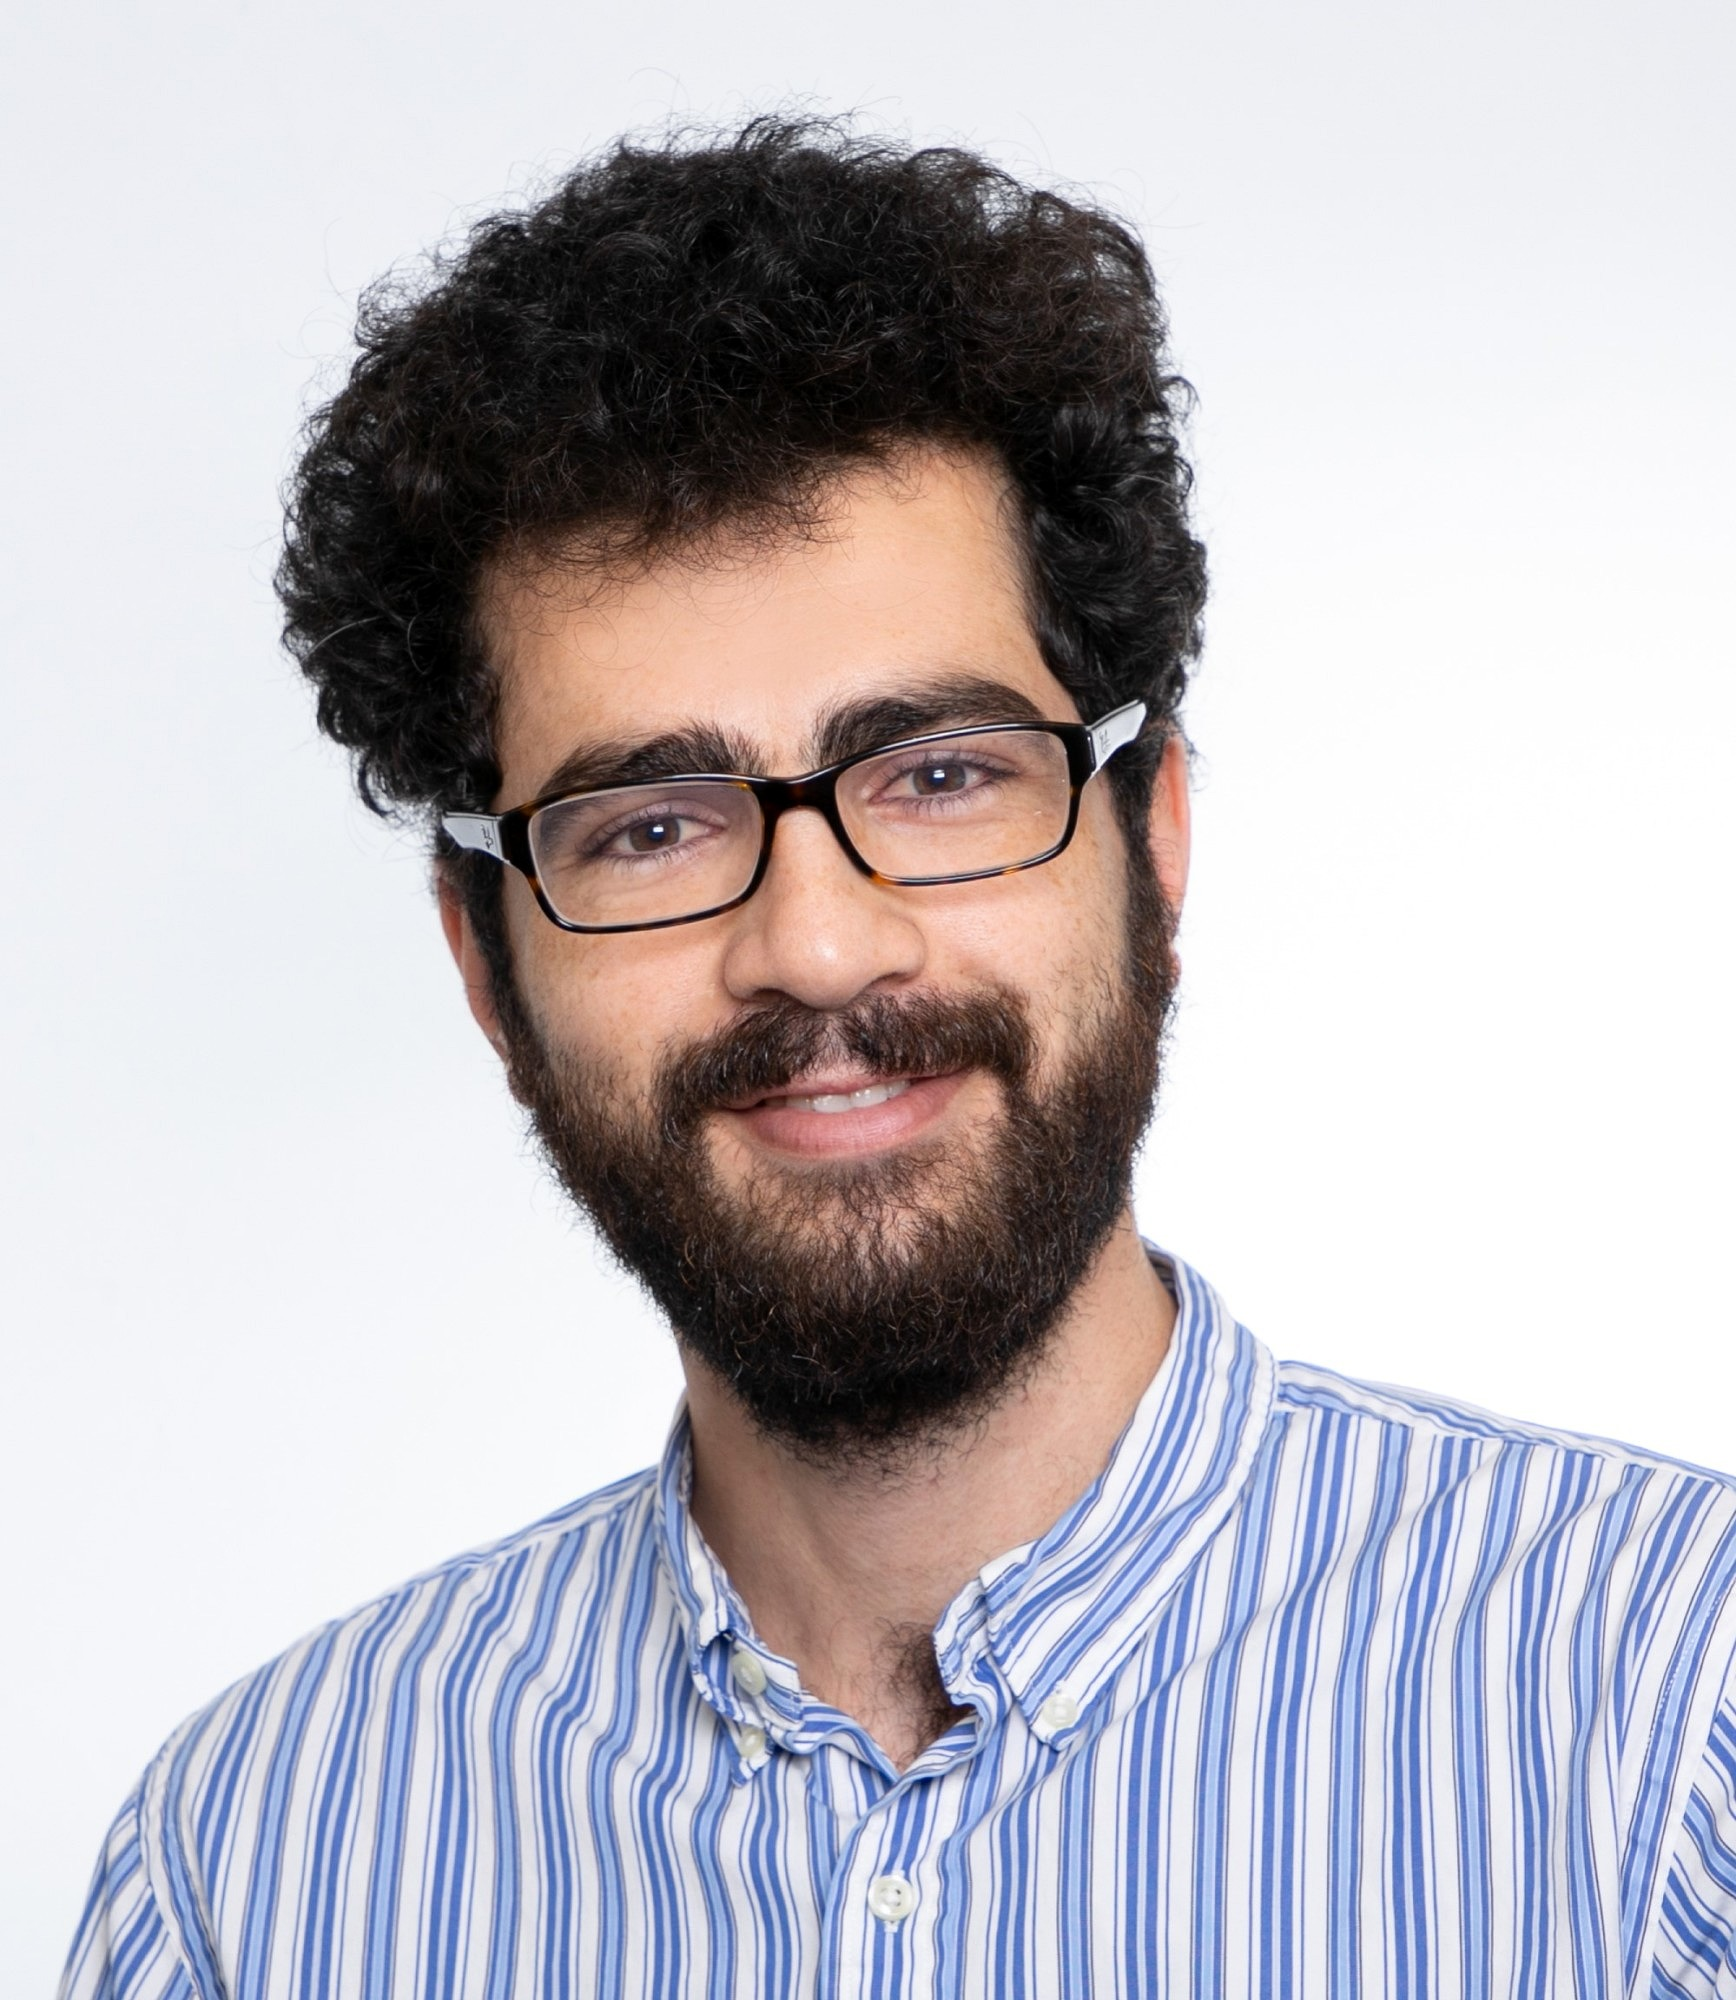 B.Sc. Arash Jalilian